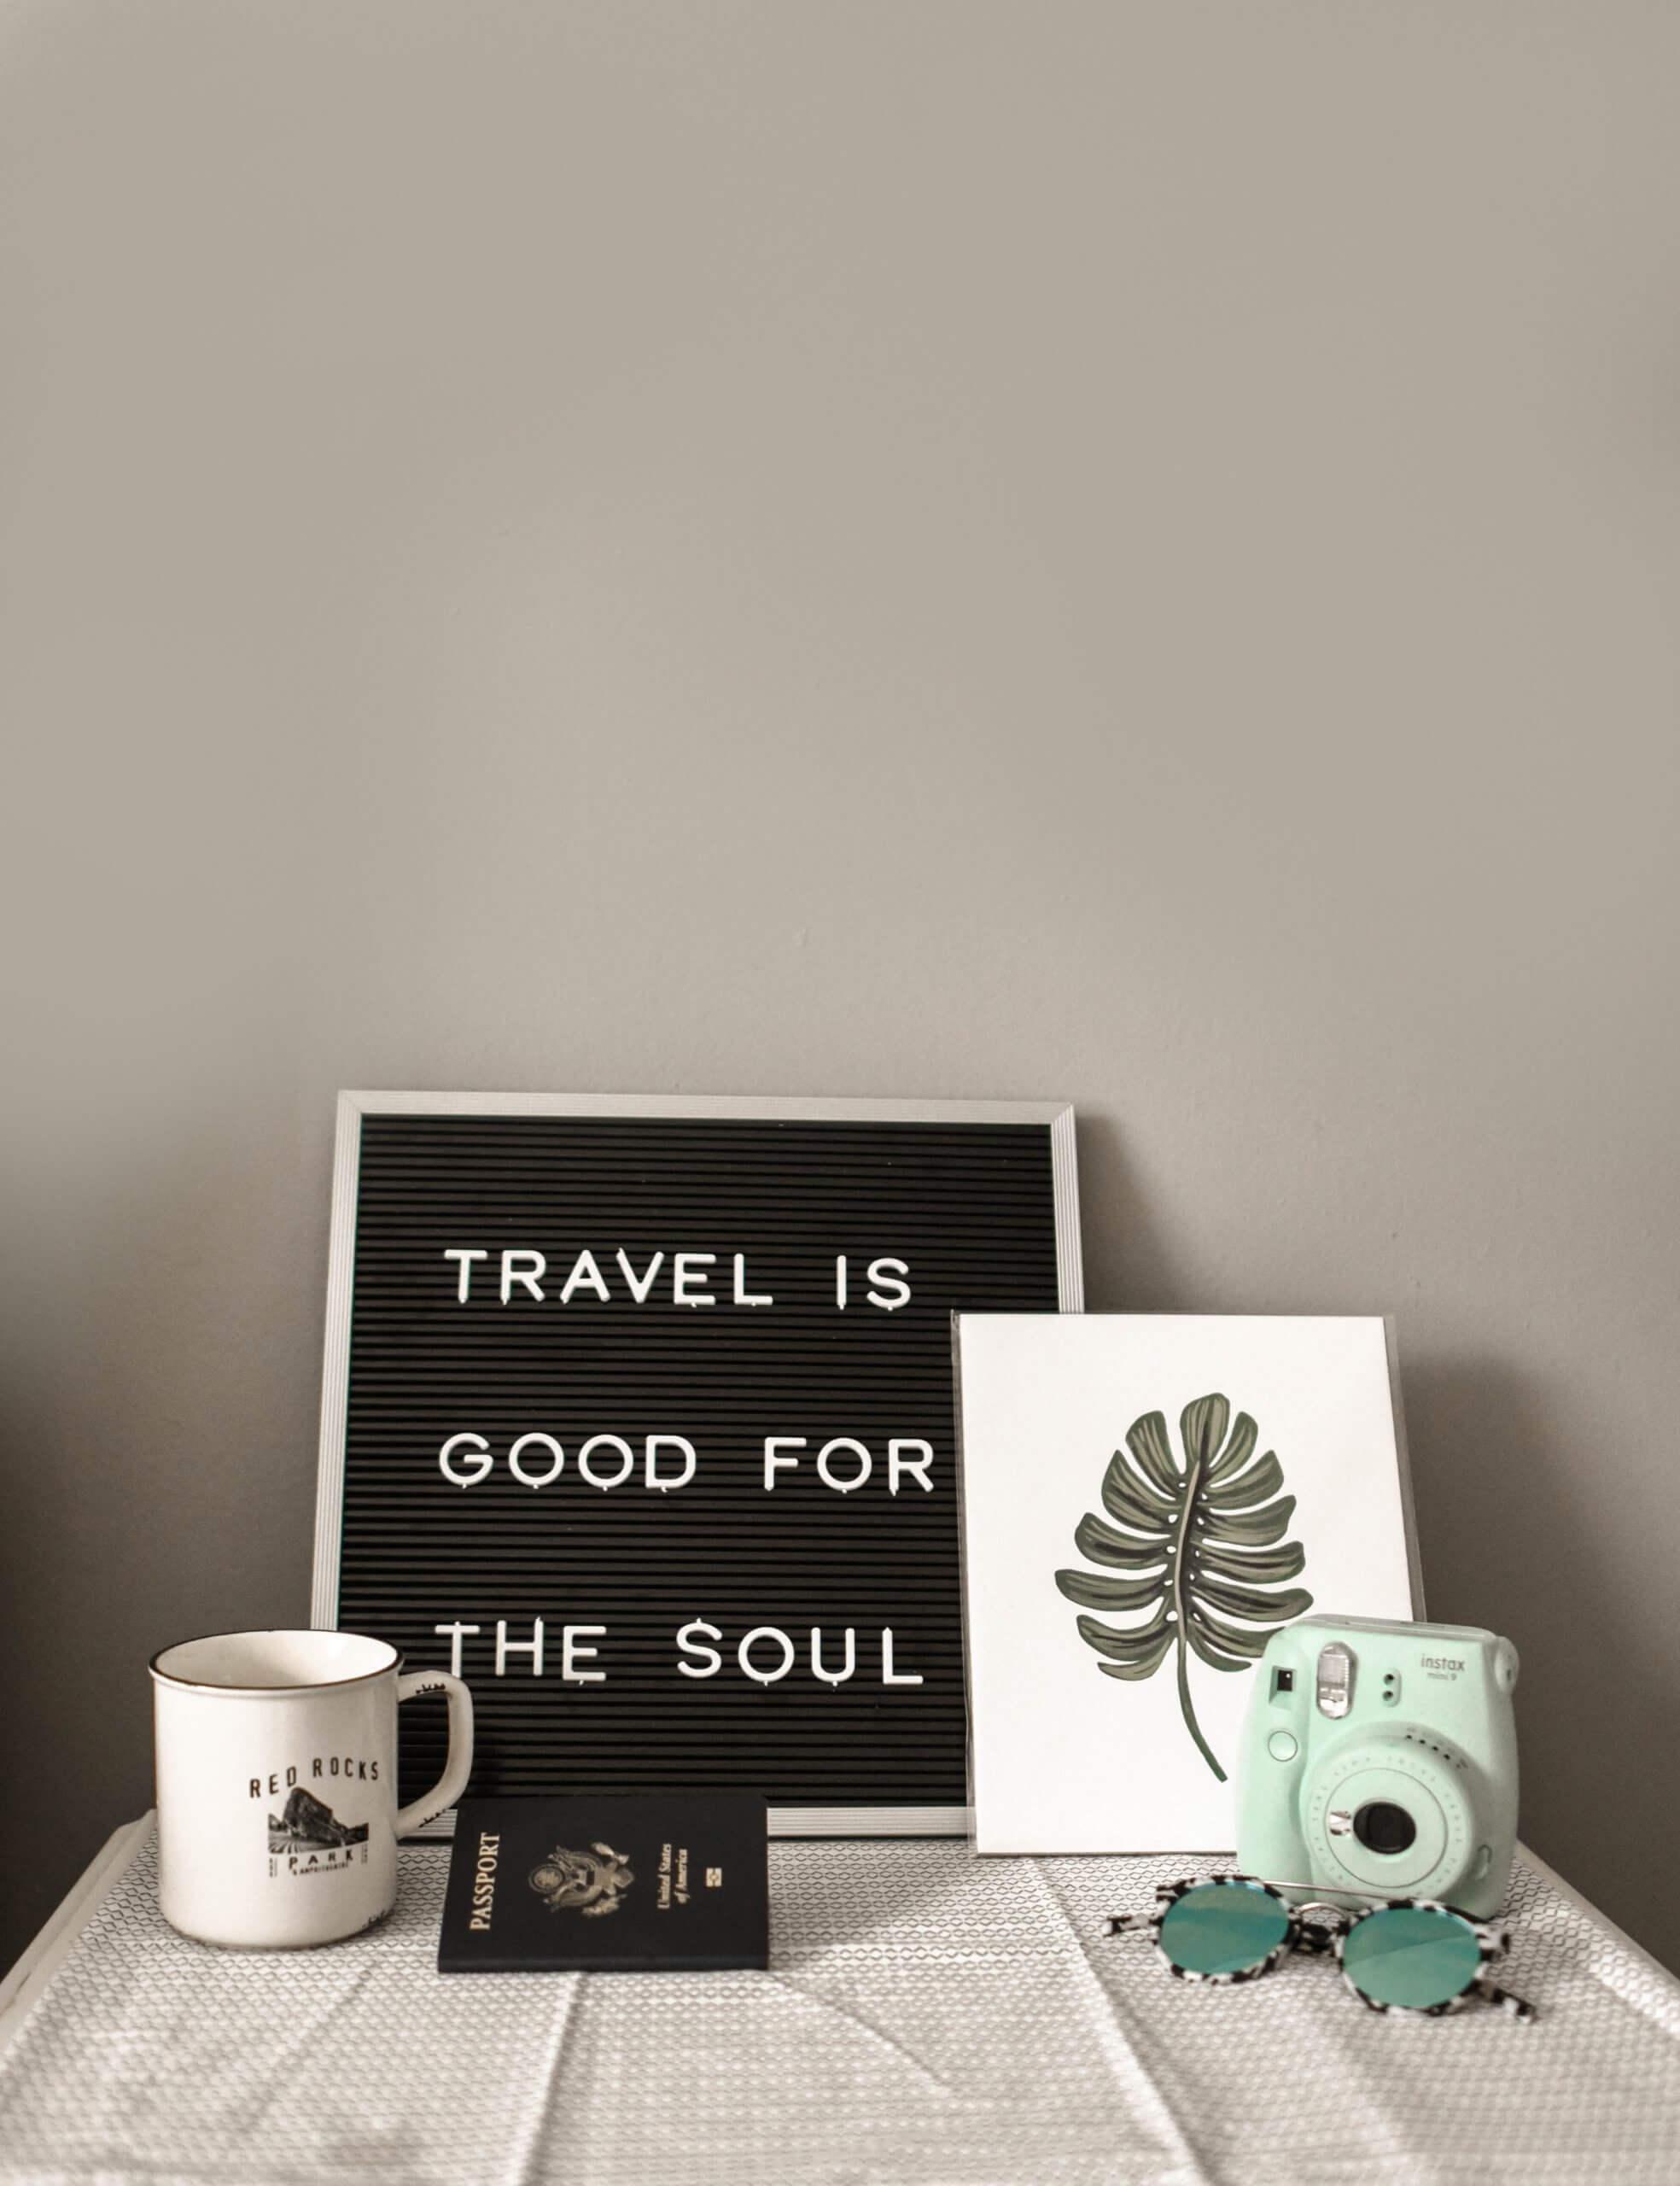 Travel is soul food